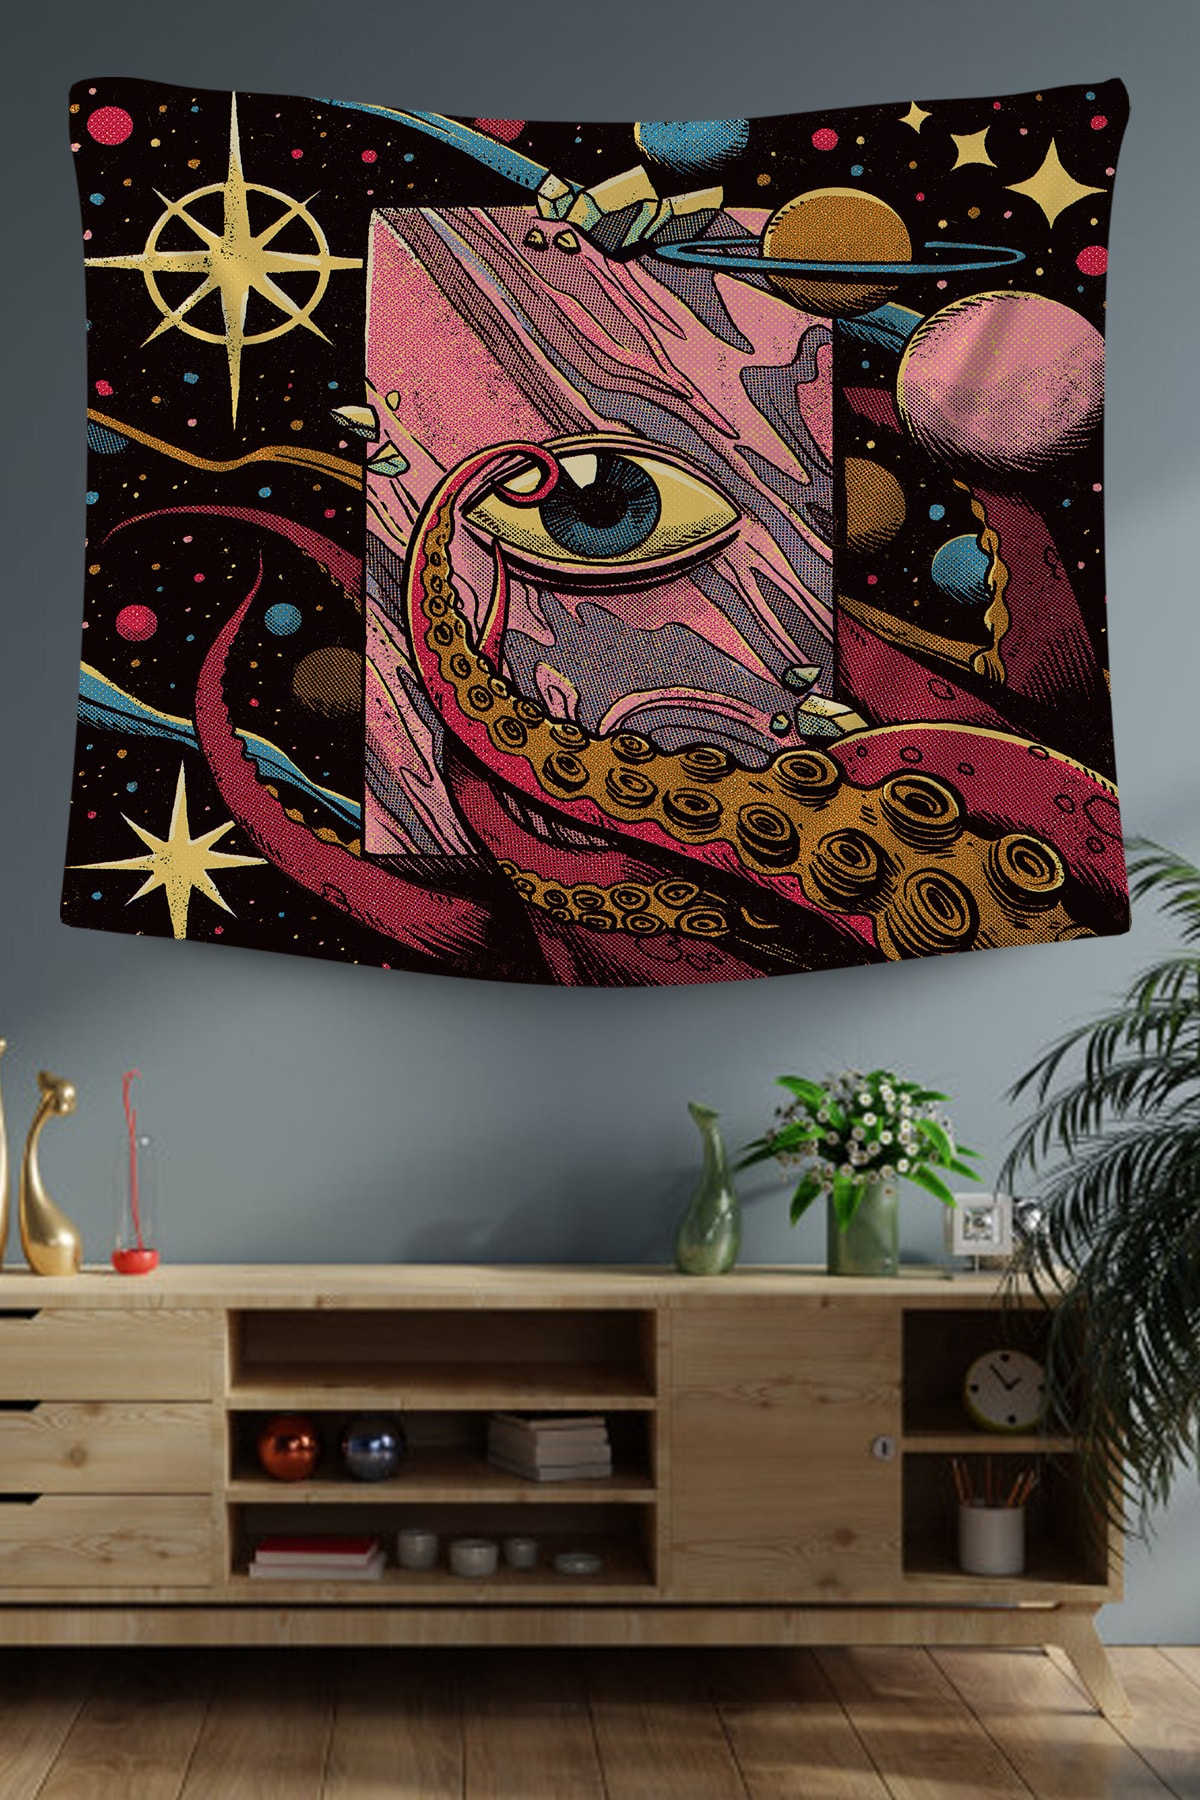 Siyah Galaksi Dekoratif Duvar Örtüsü 70x100